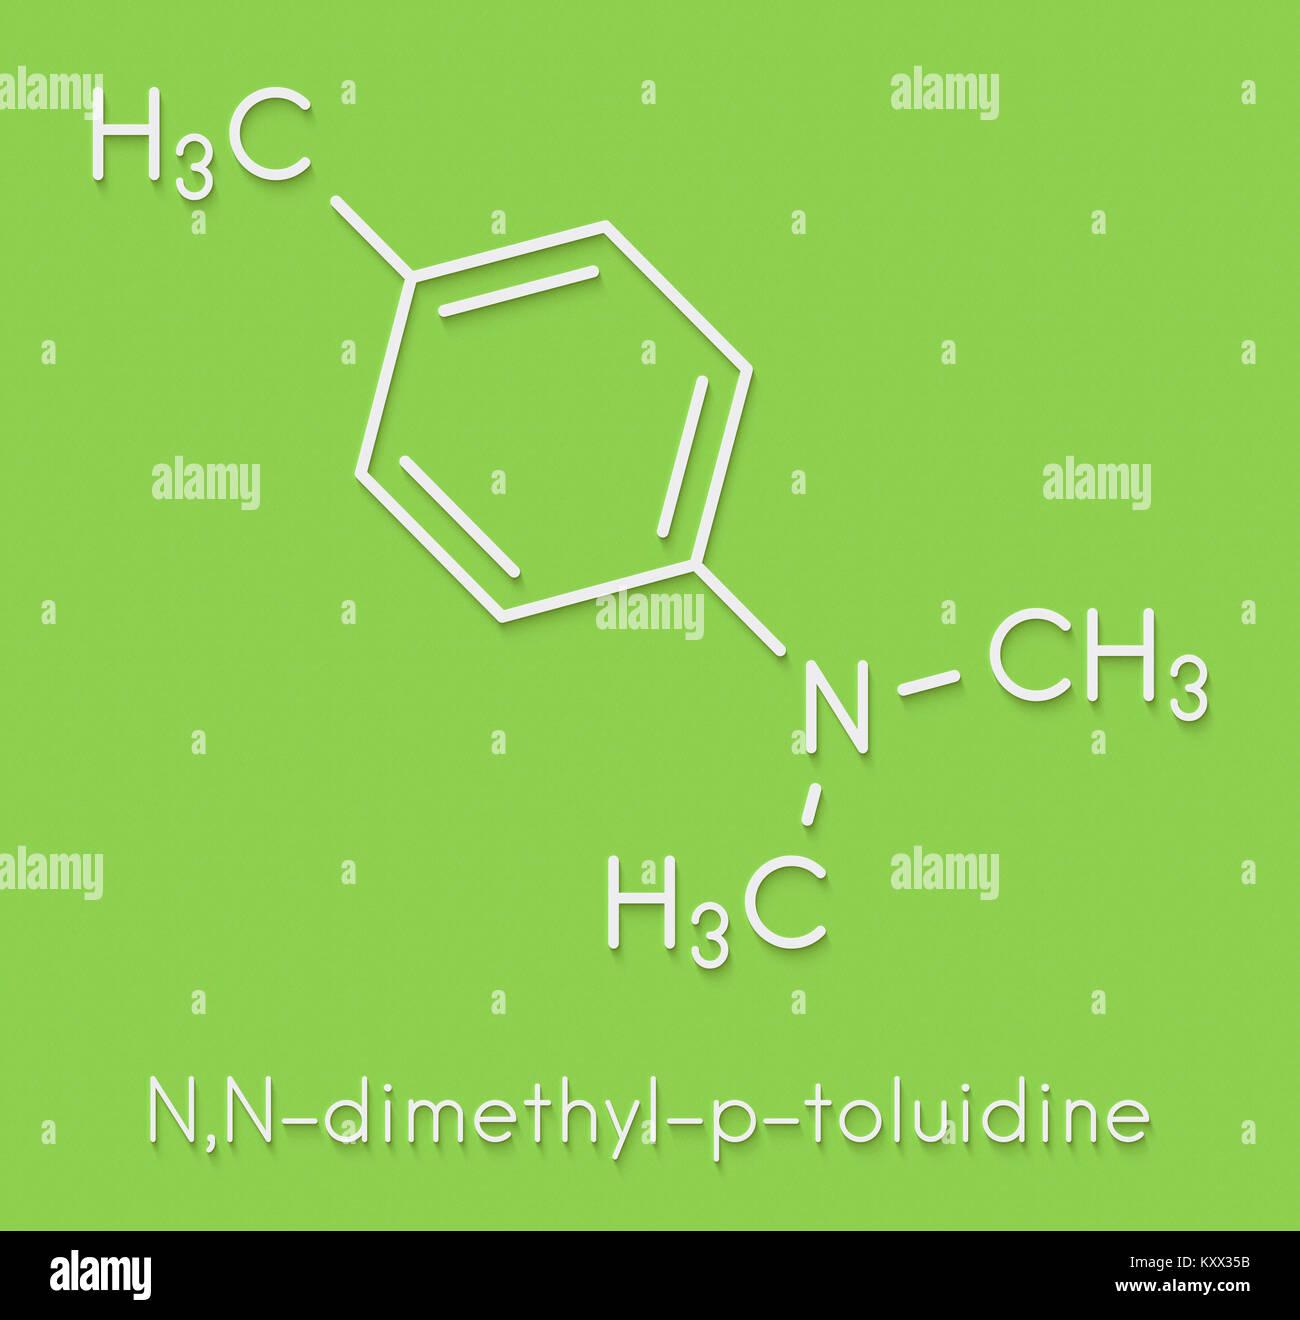 N,N-dimethyl-p-toluidine (N,N,4-trimethylaniline) polymerization catalyst molecule. Skeletal formula. - Stock Image